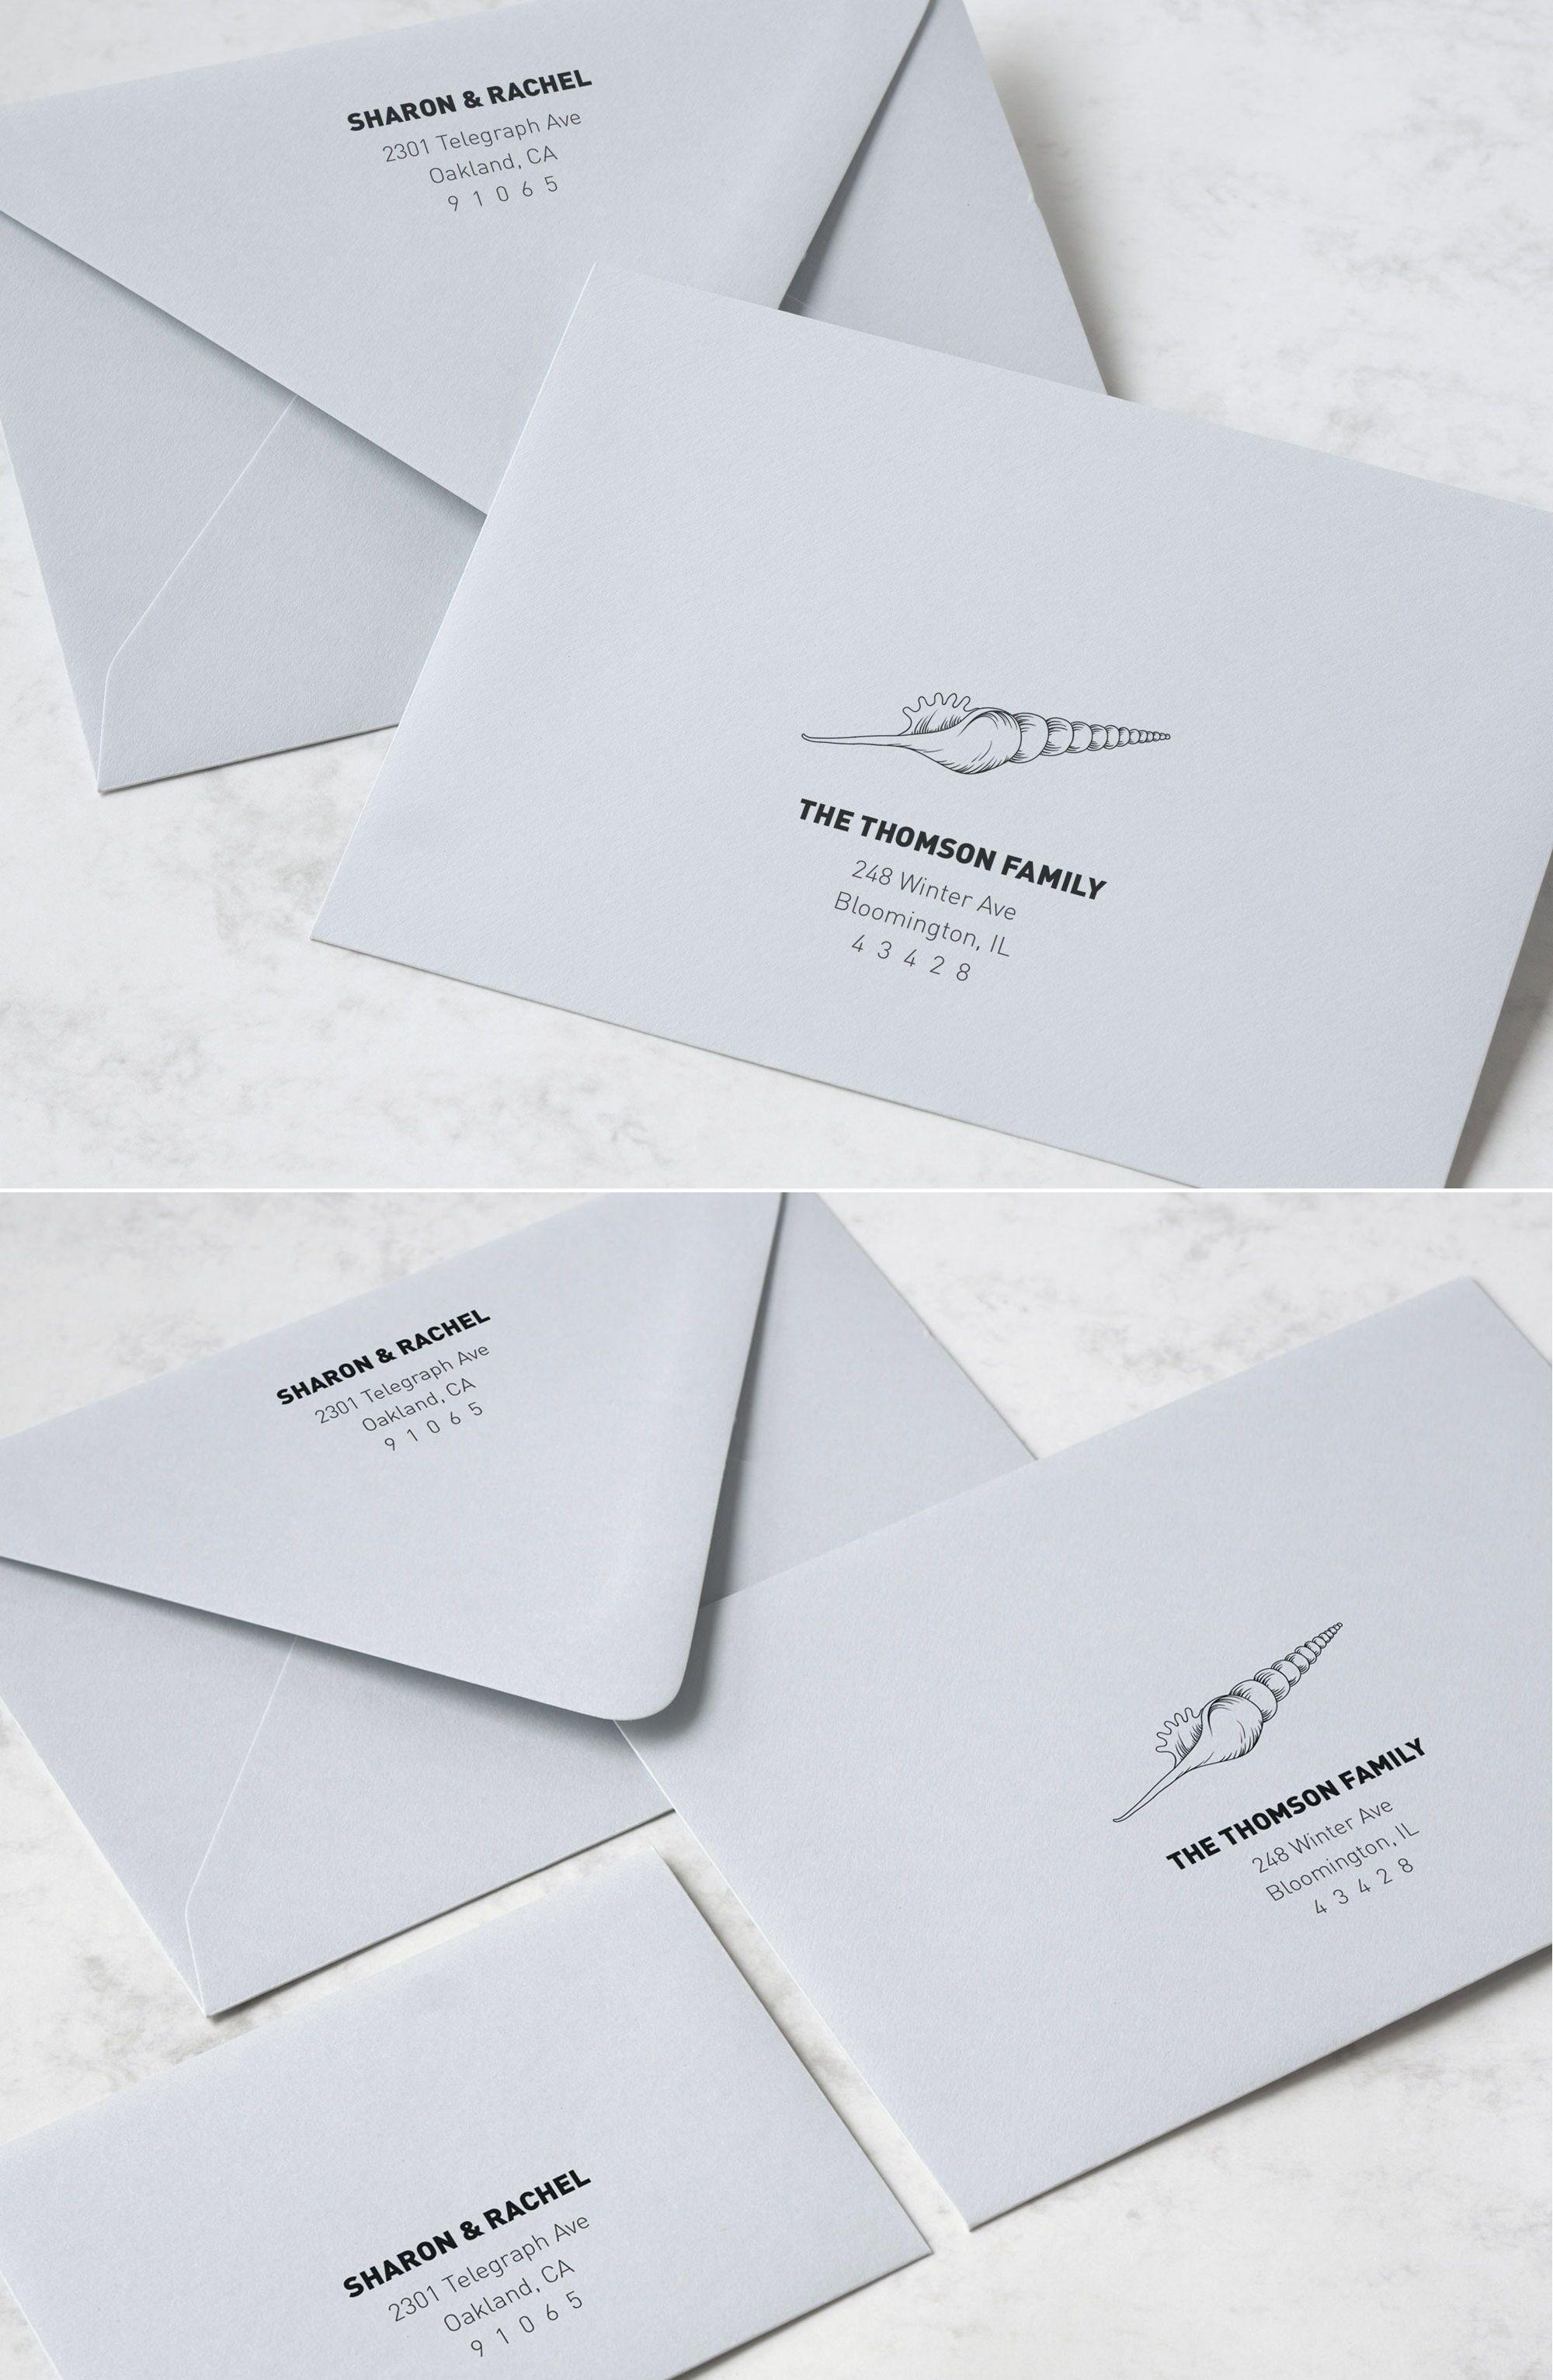 Beach Wedding Envelope Addressing Template For Your Wedding Invitations Wedding Invitation Envelopes Envelope Addressing Template Addressing Envelopes Wedding